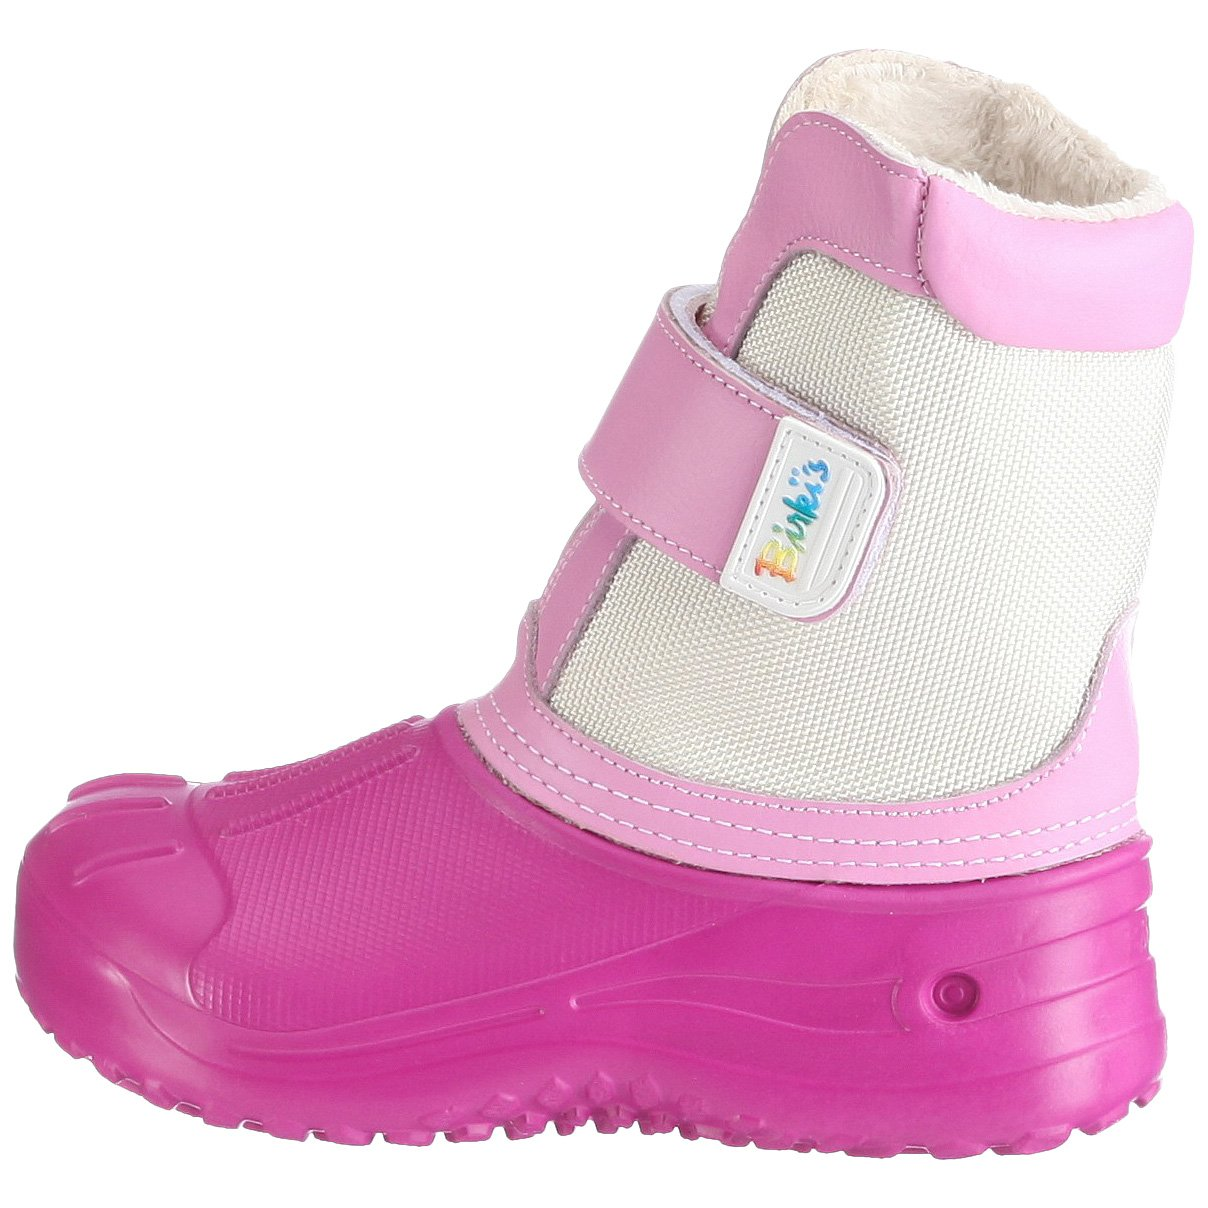 Birki Fun Boot 183113, Mädchen Stiefel, pink, (Pink Pink), EU 26   Amazon.de  Schuhe   Handtaschen 97a5ce5139